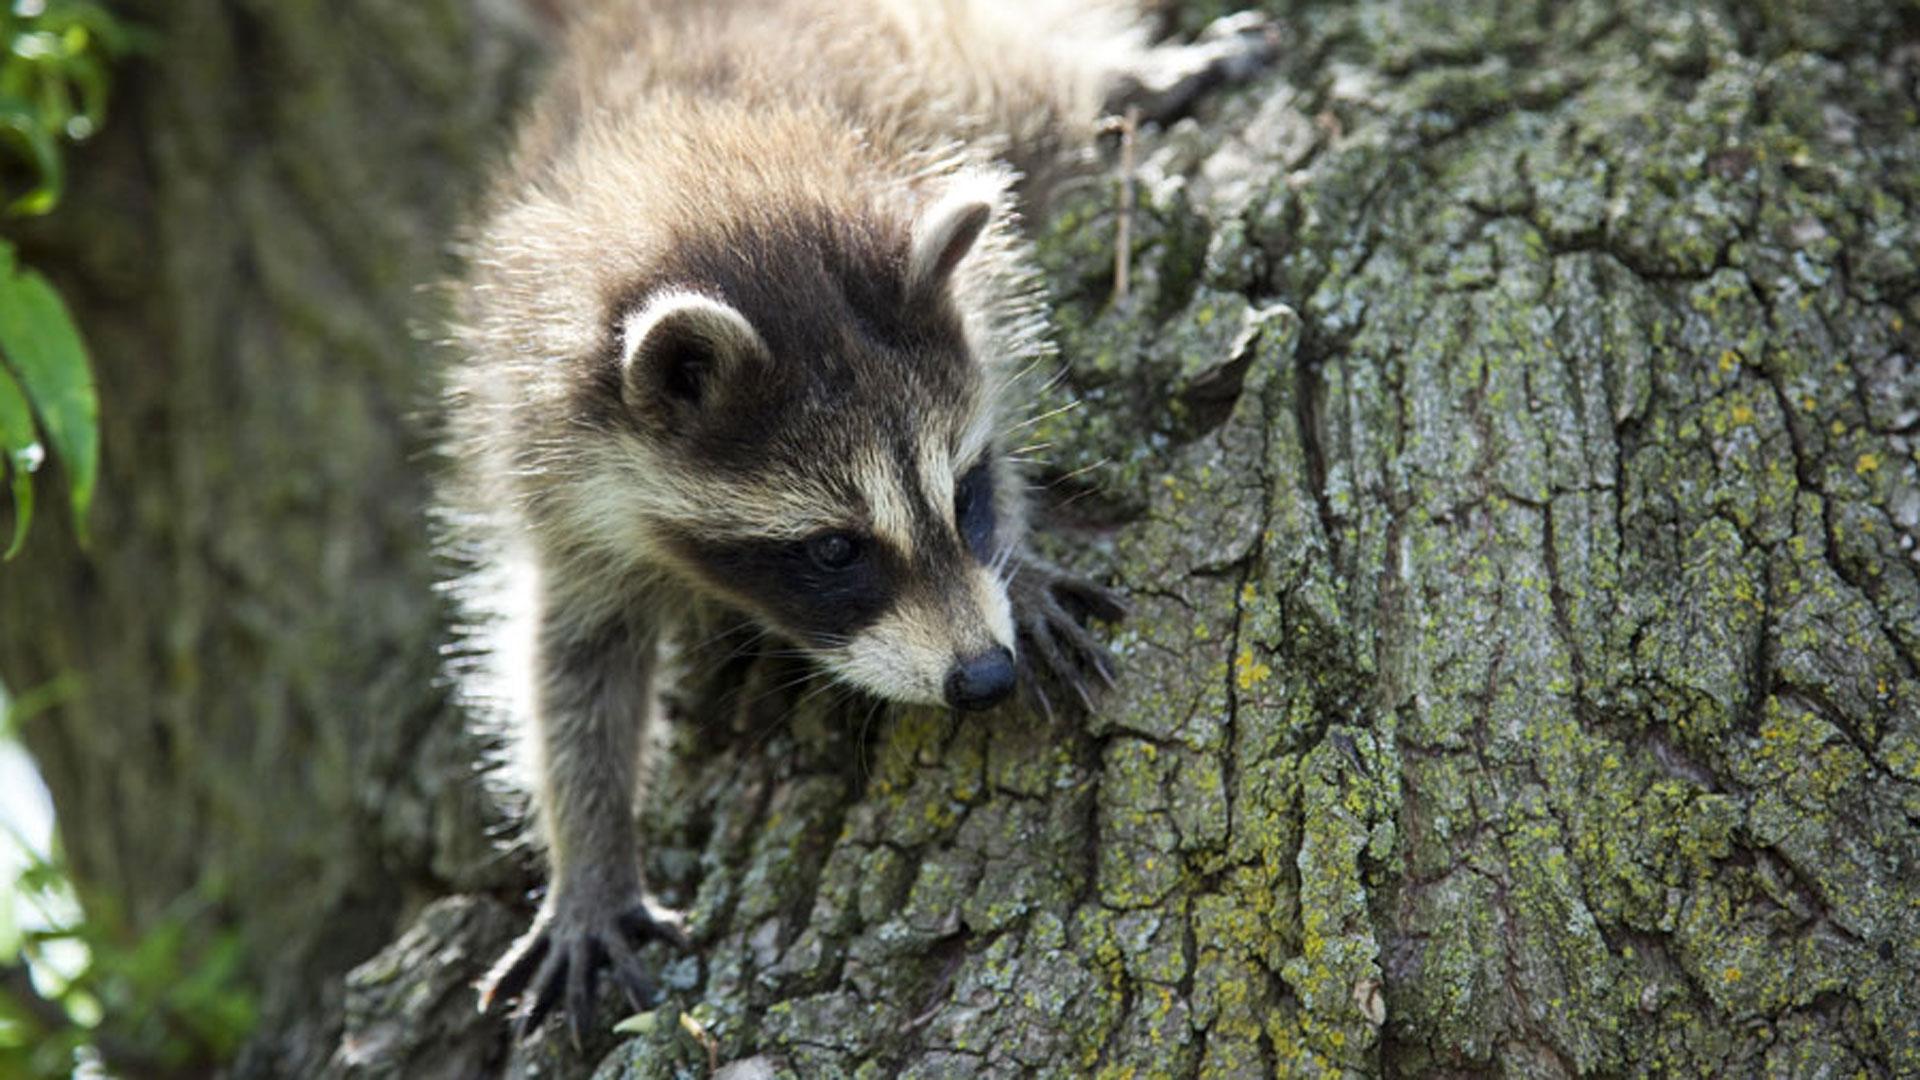 Cute White Baby Rabbits Wallpapers Raccoon Nation Raccoon Fact Sheet Nature Pbs